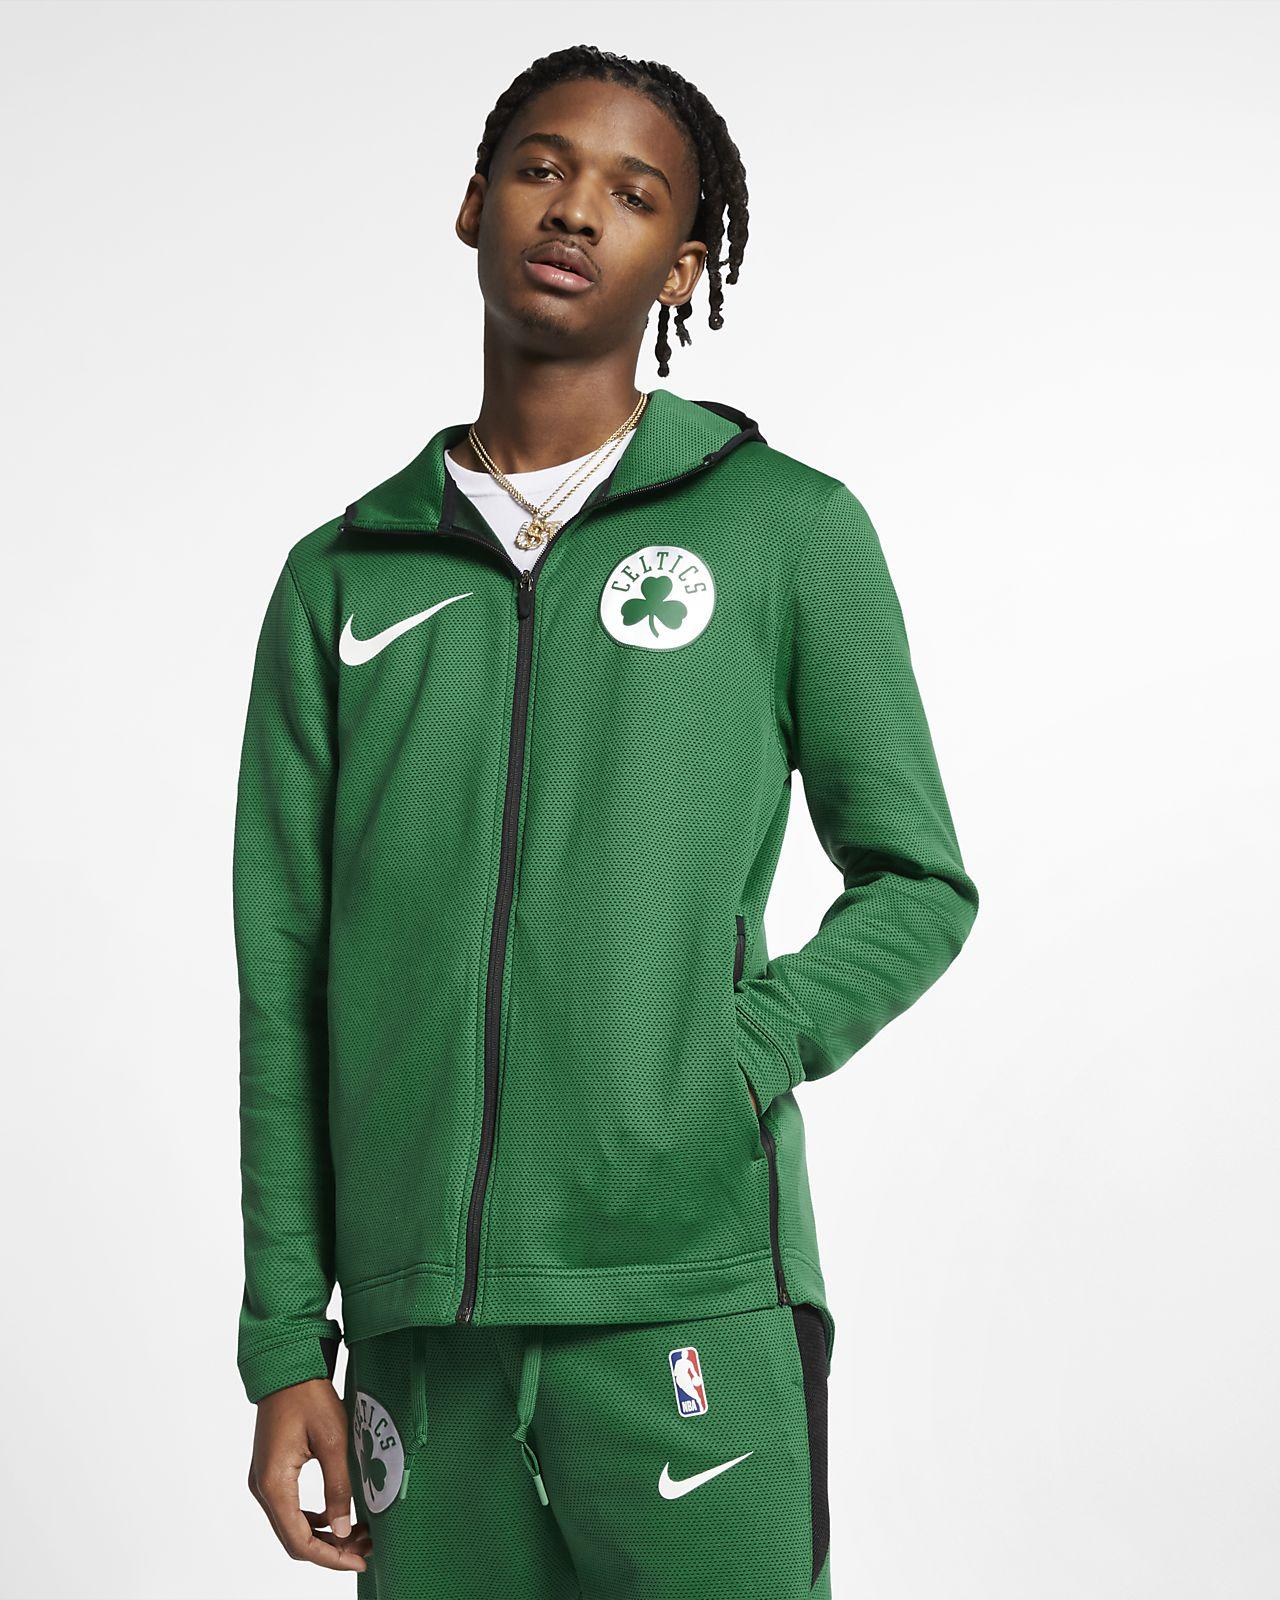 aa00c7f03 Boston Celtics Nike Therma Flex Showtime Men s NBA Hoodie. Nike.com GB